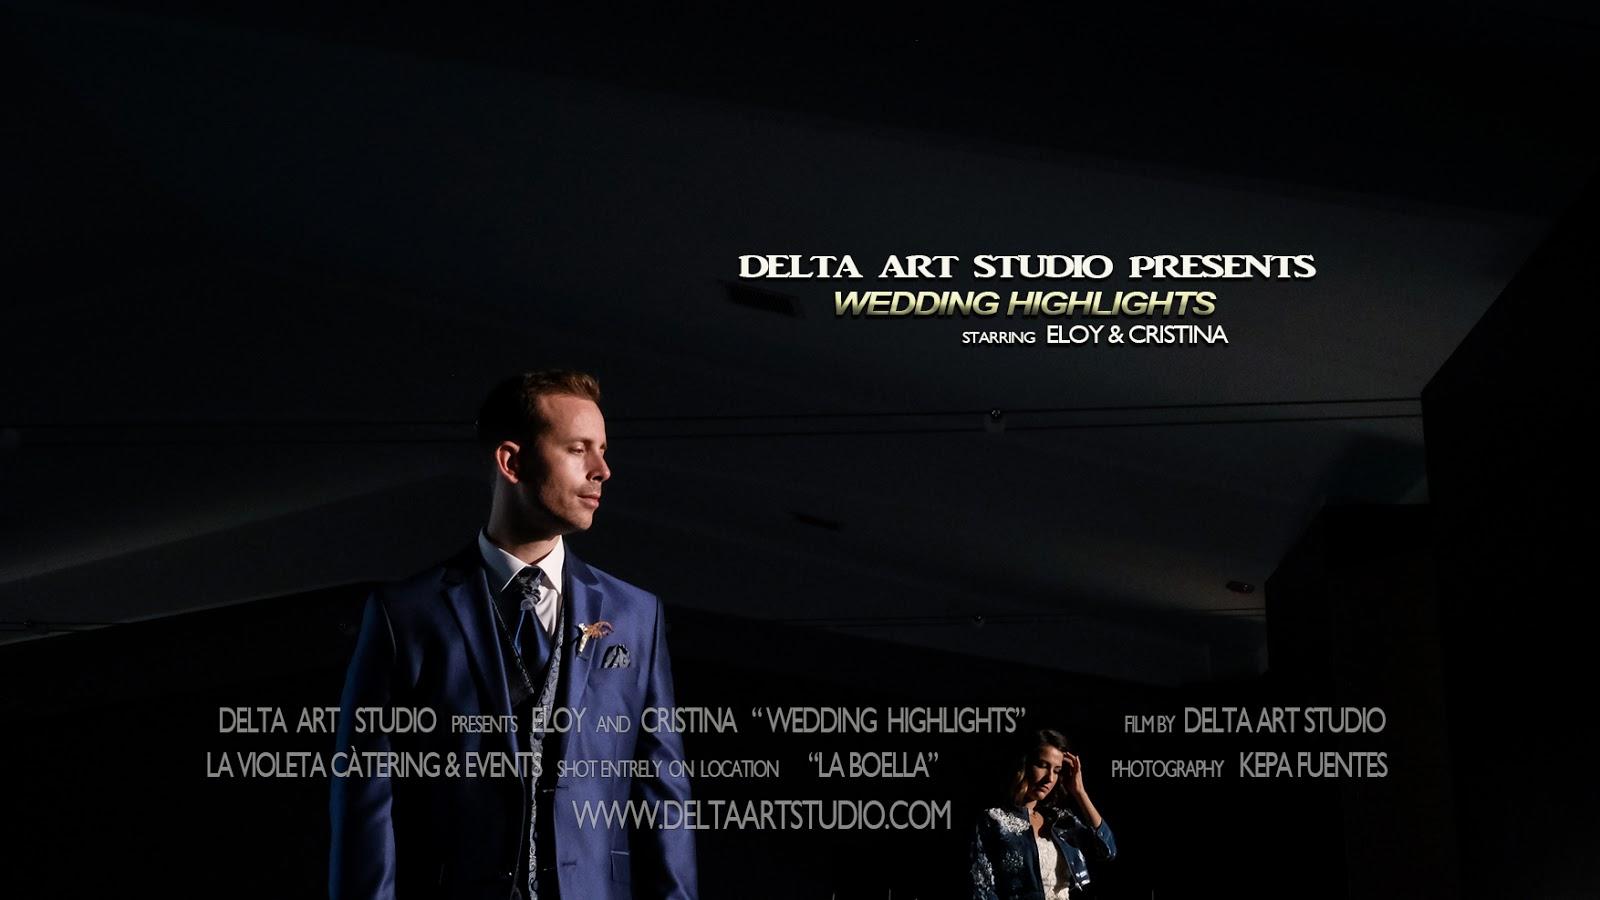 delta art studio blog eloy amp cristina wedding highlights